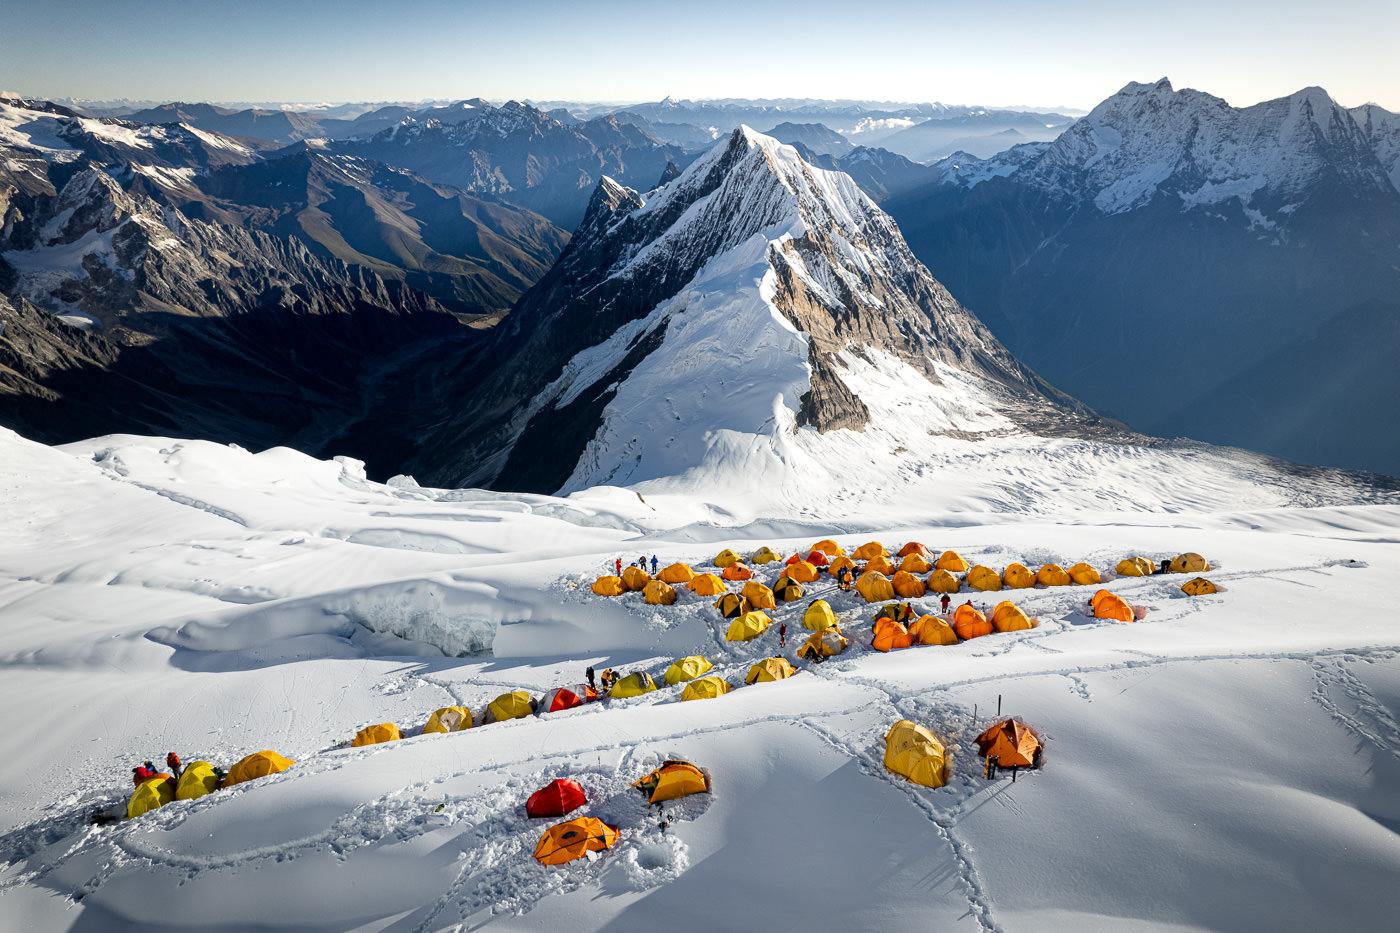 CLIMBING MANASLU MOUNTAIN: PHOTO GALLERY